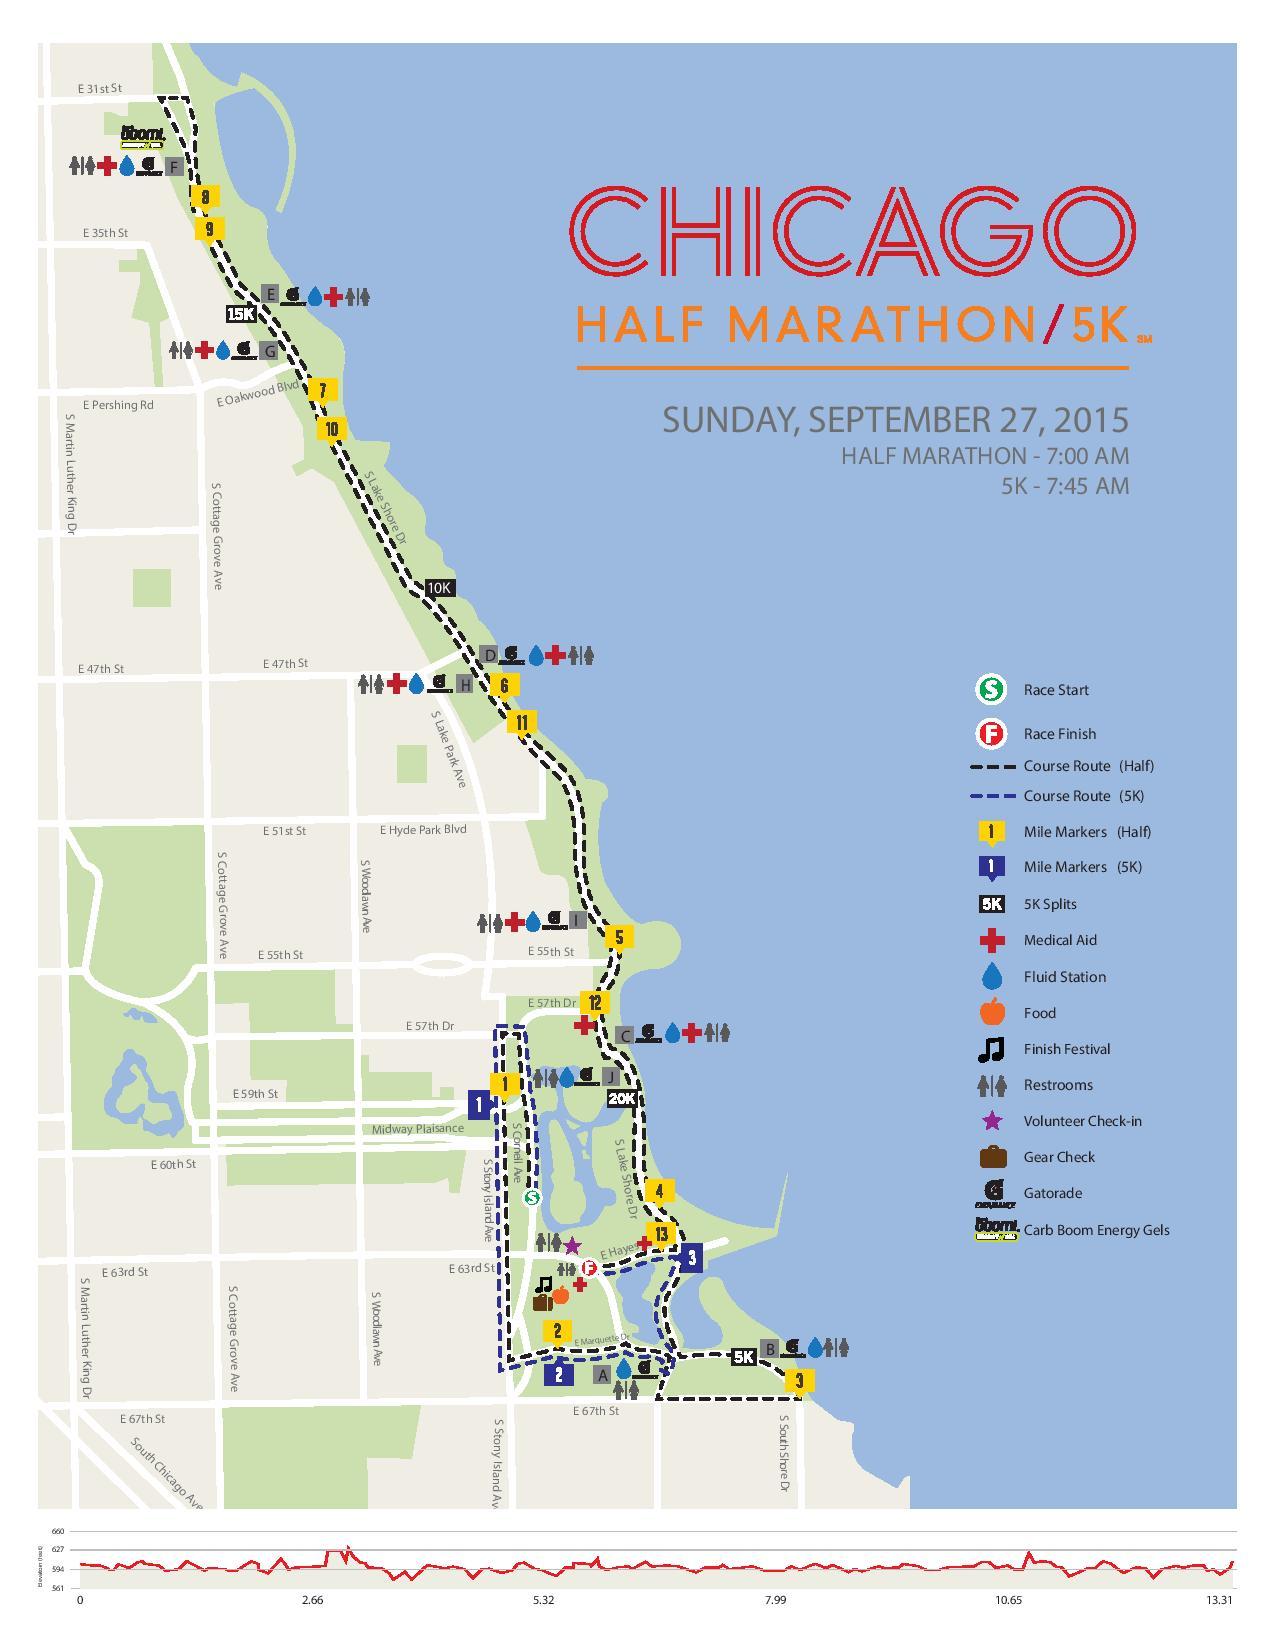 How To Park For The Chicago Half Marathon SpotHero Blog - Chicago marathon map